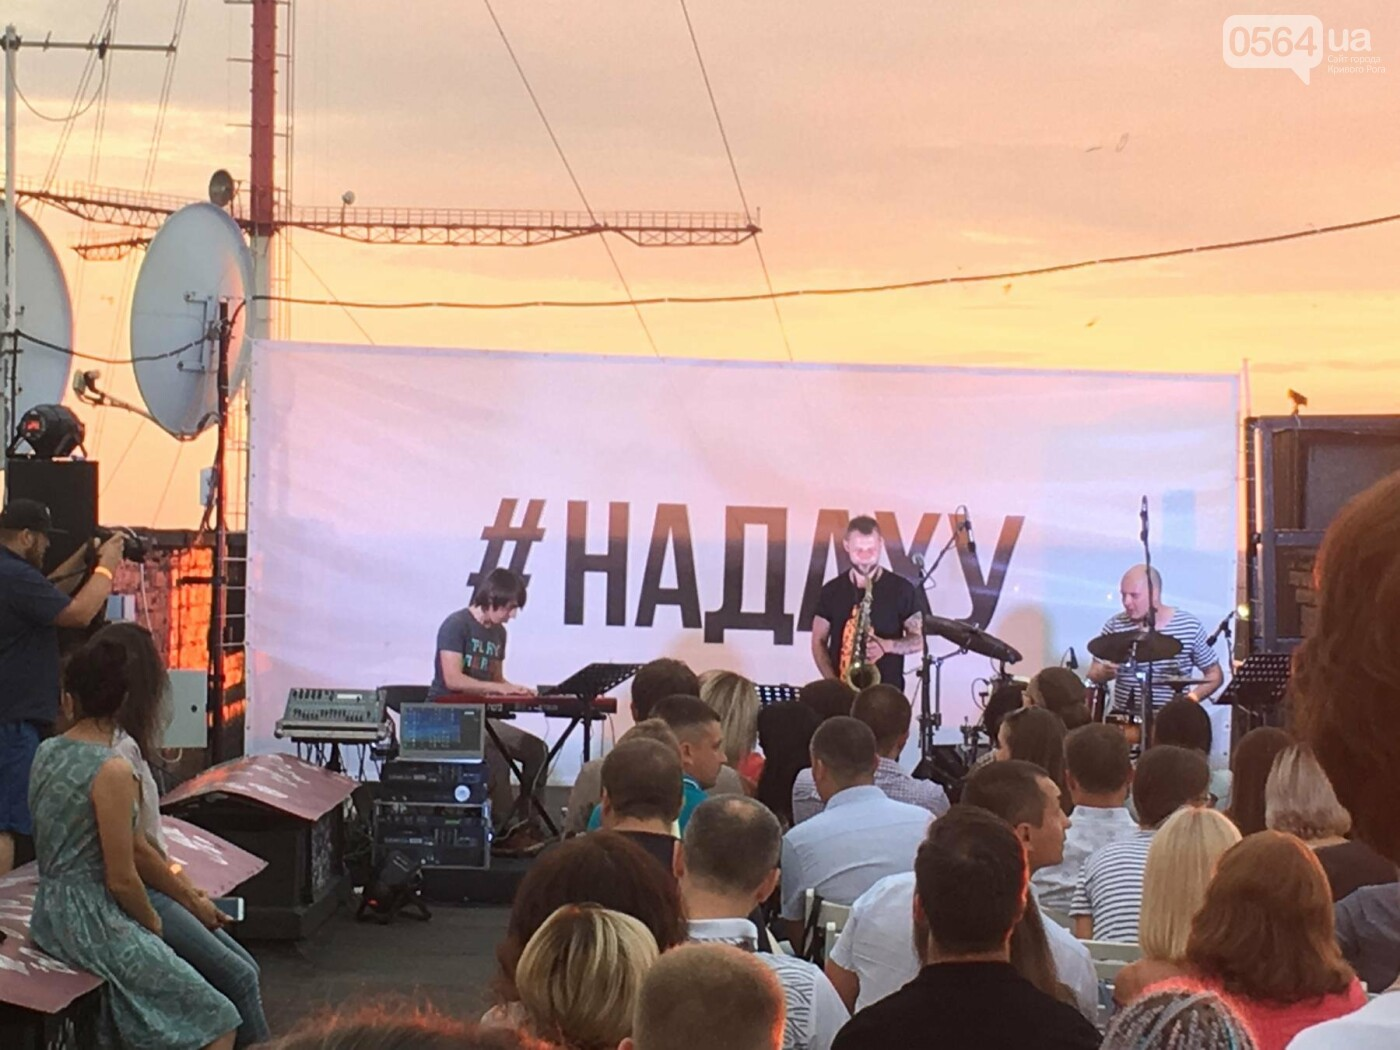 Сотни криворожан встречали закат на крыше отеля под мелодии джаза, - ФОТО, ВИДЕО, фото-14